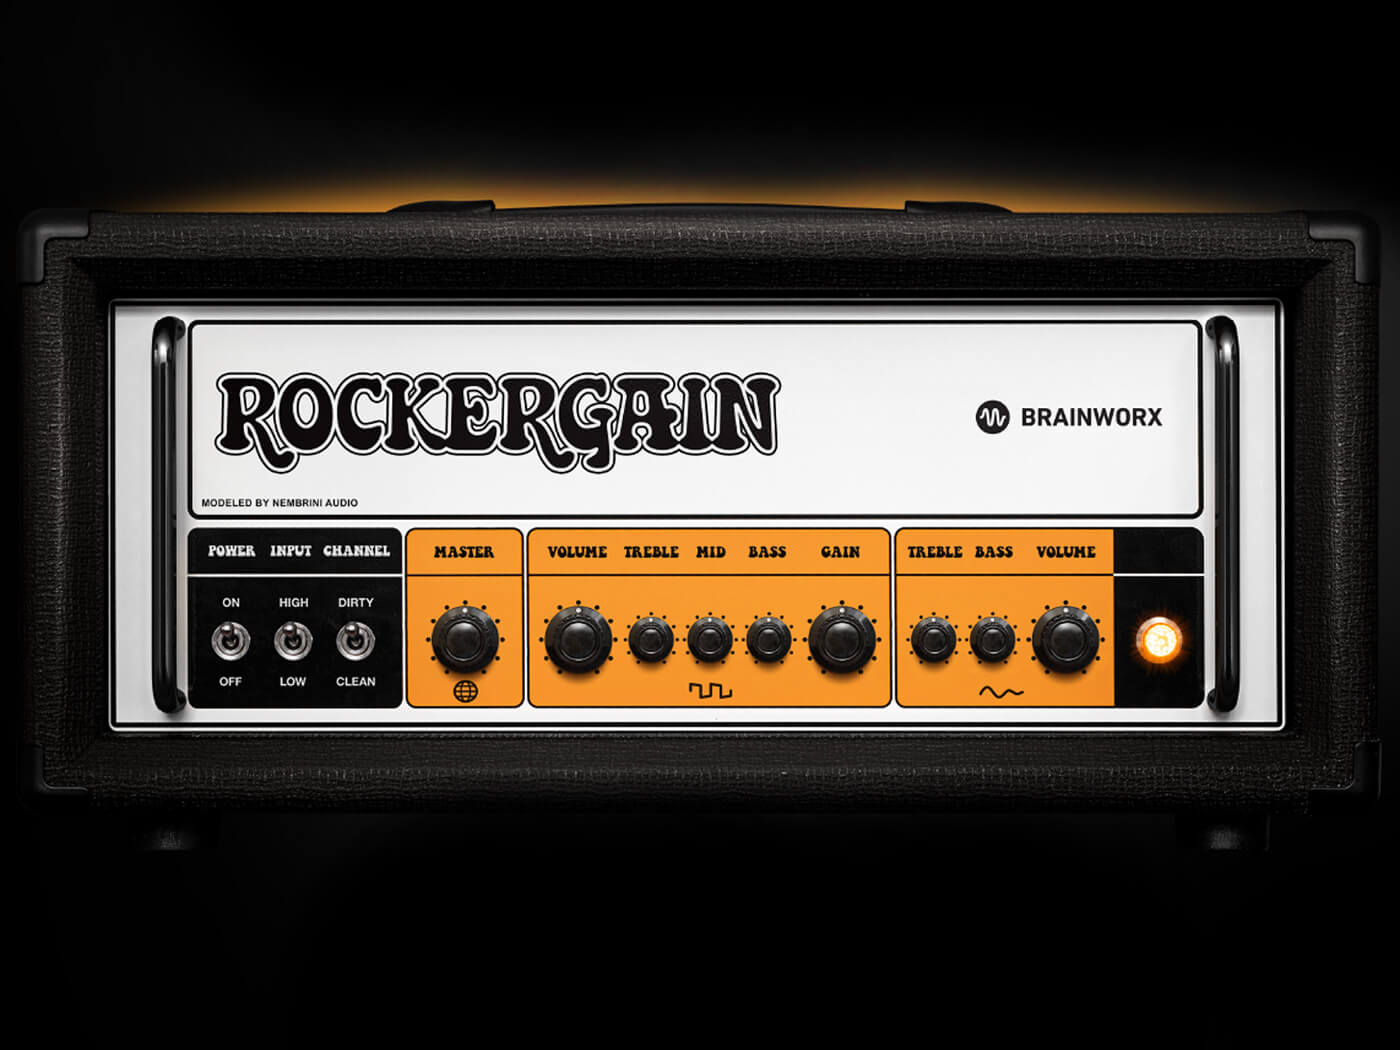 Brainworx Rockergain 100